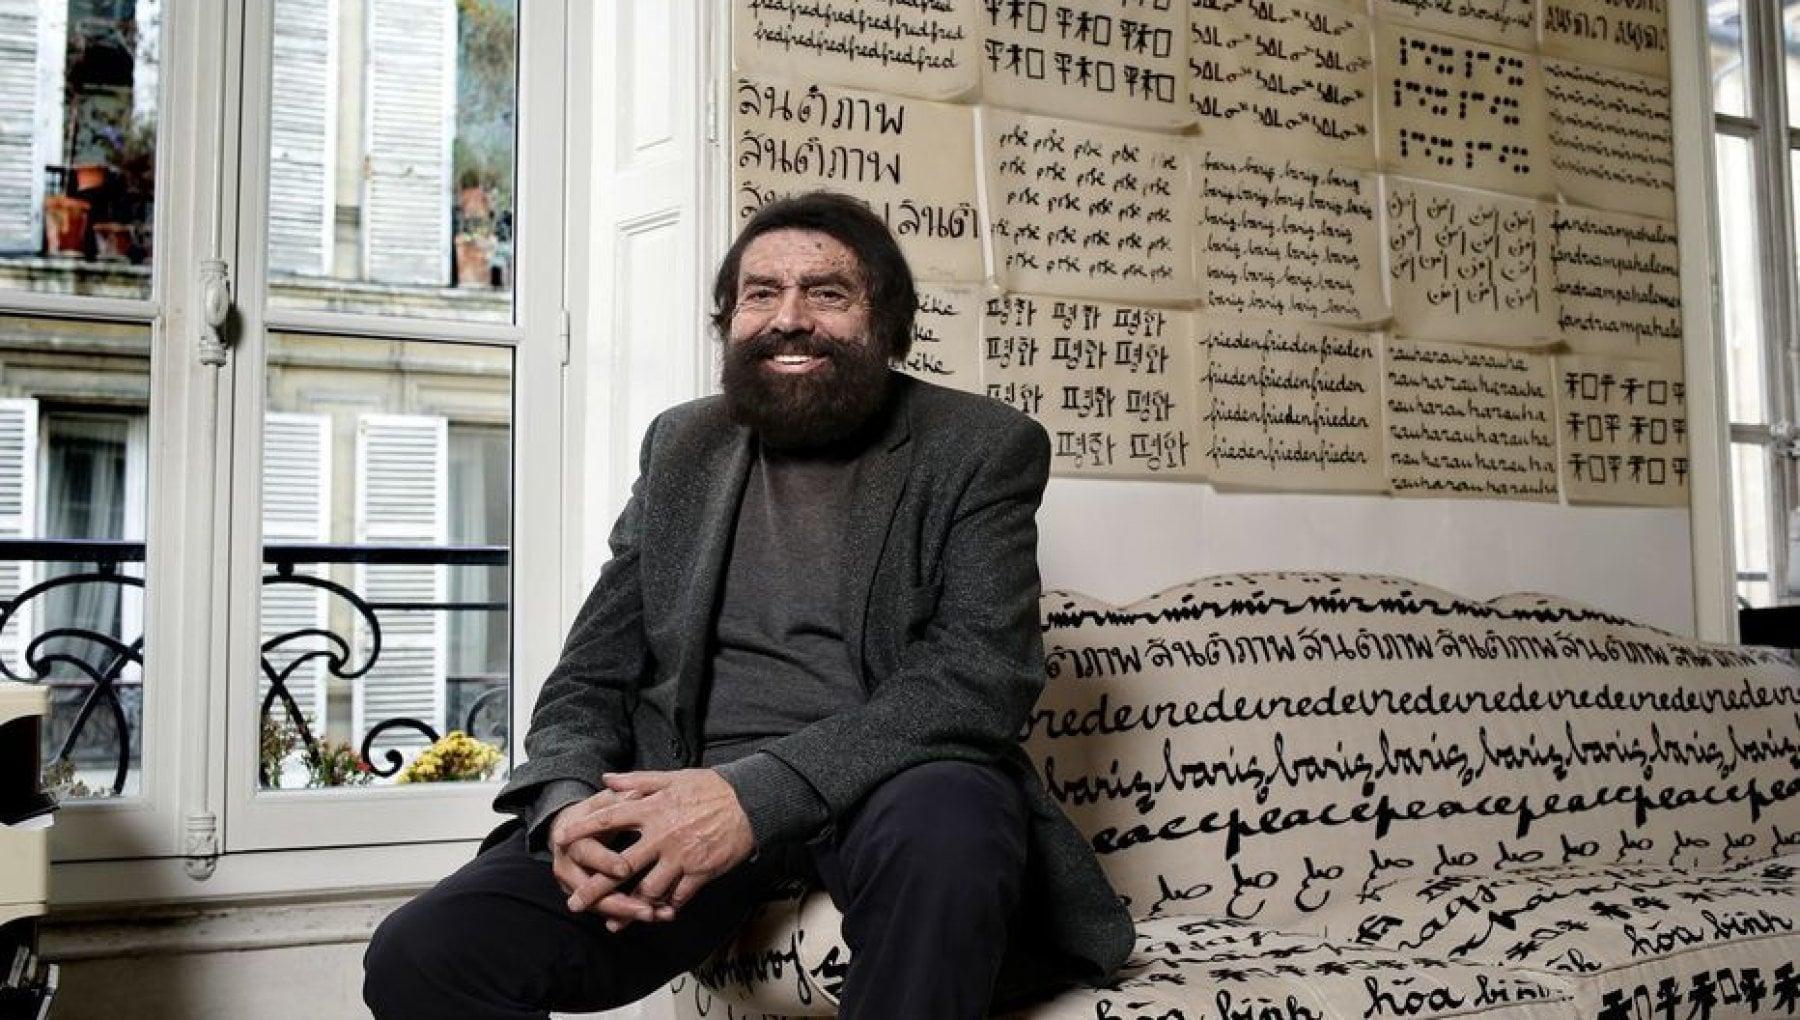 120707341 158f4402 64bc 4172 8c35 2fd1dbca1232 - Parigi, aggredito a casa sua lo scrittore ebreo Marek Halter